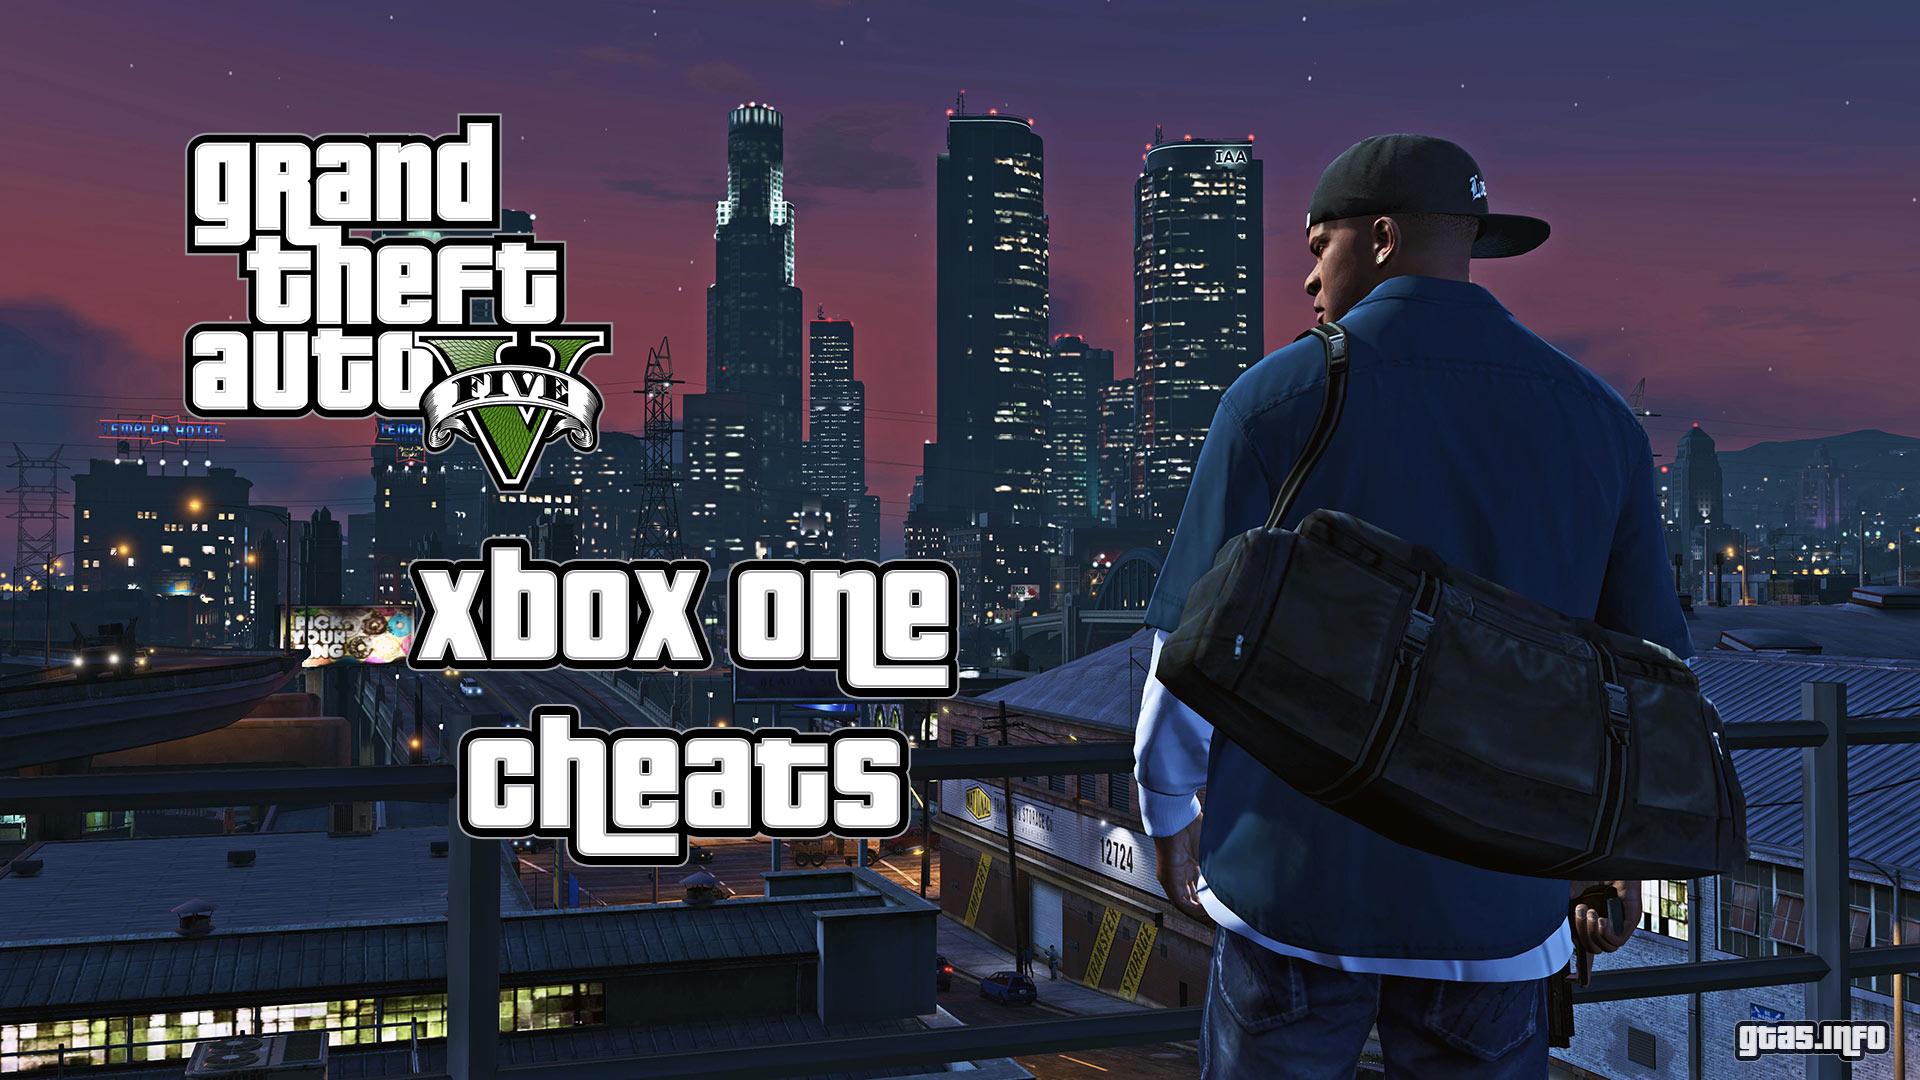 GTA 5 Xbox One Cheats